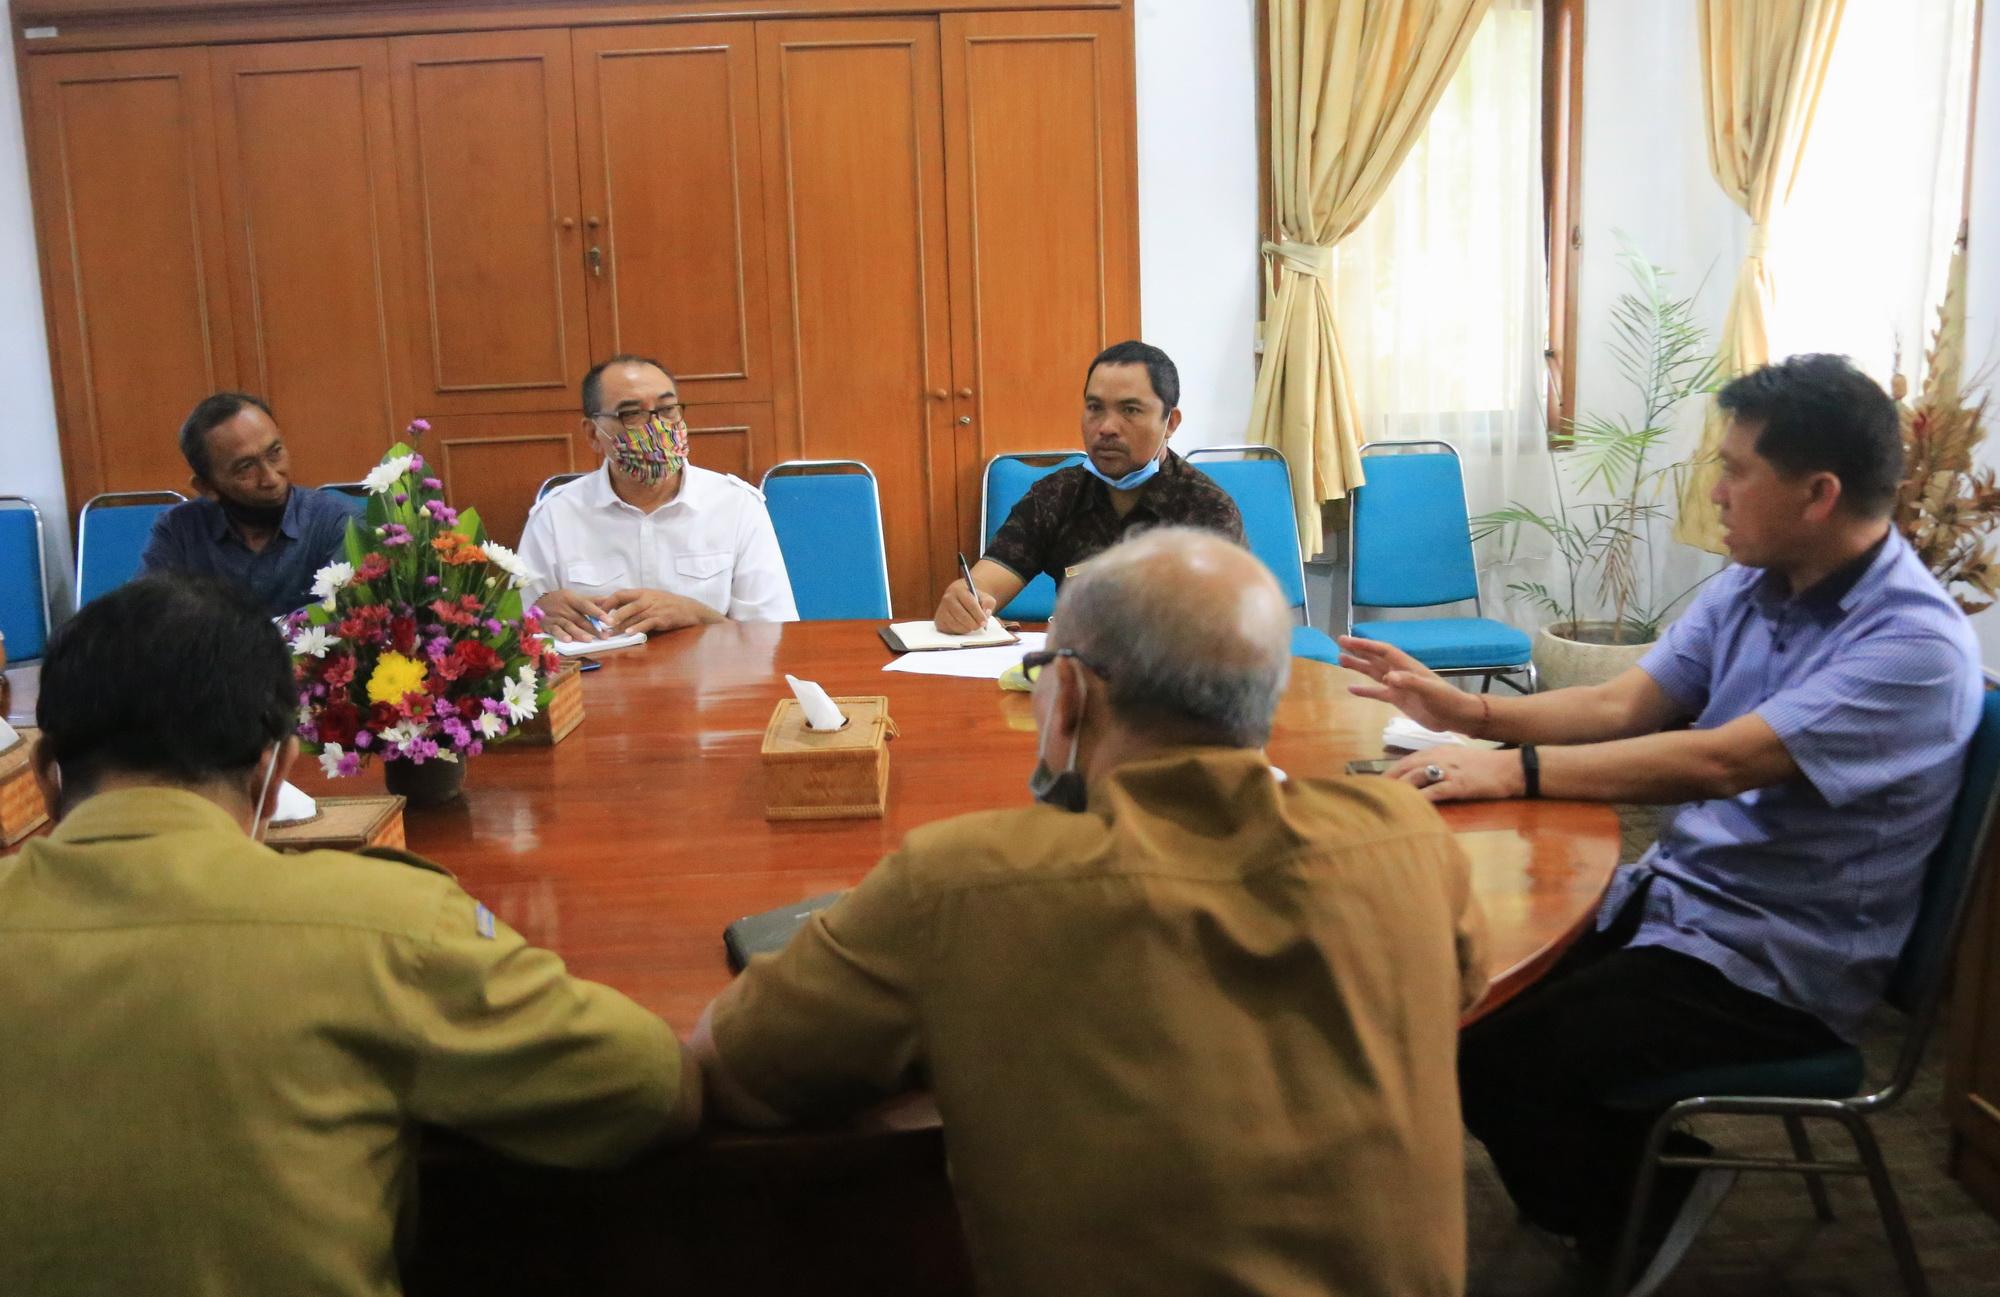 Foto: BUPATI SUWIRTA BUPATI Suwirta memimpin rapat terkait Skema Dana Inovasi RIF bersama pengurus BUMDesMa di Kantor Pemkab Klungkung, Senin (10/8). Foto: baw